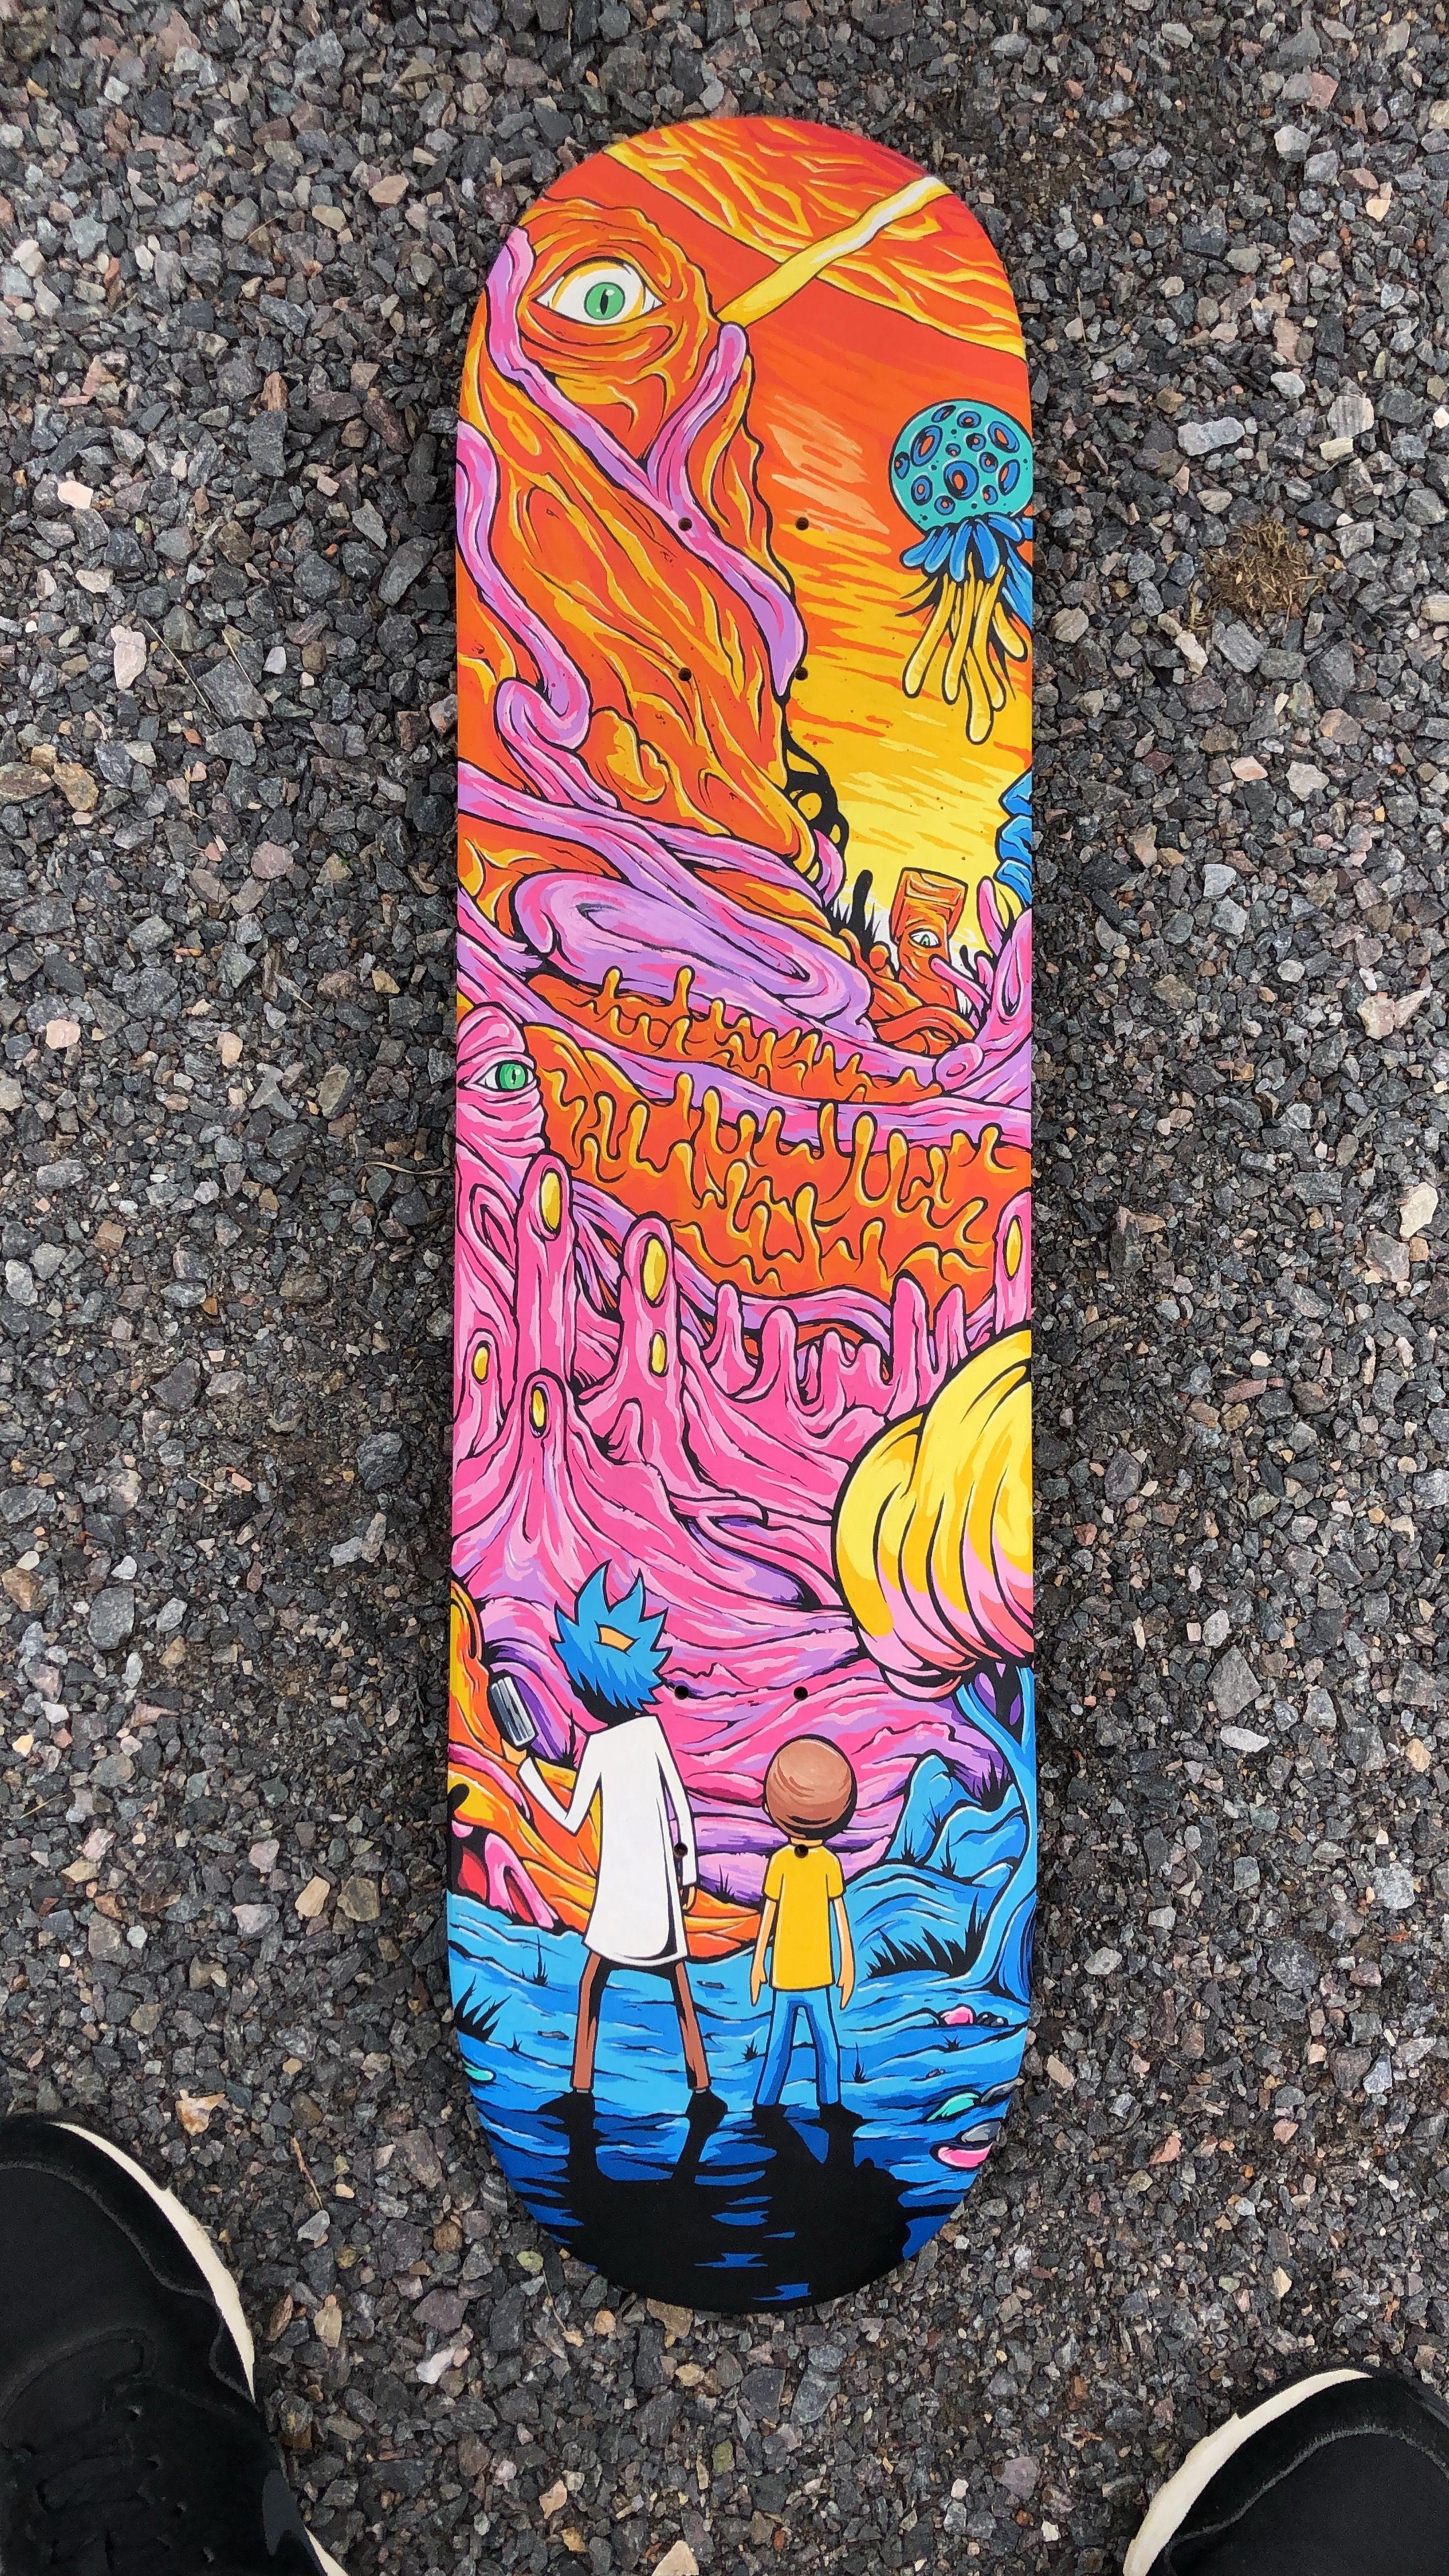 Custom Skateboard I Made Months Ago Rickandmorty Rick Picklerick Morty Wubbalubbadubdub Ge Skateboard Art Design Skateboard Deck Art Custom Skateboards